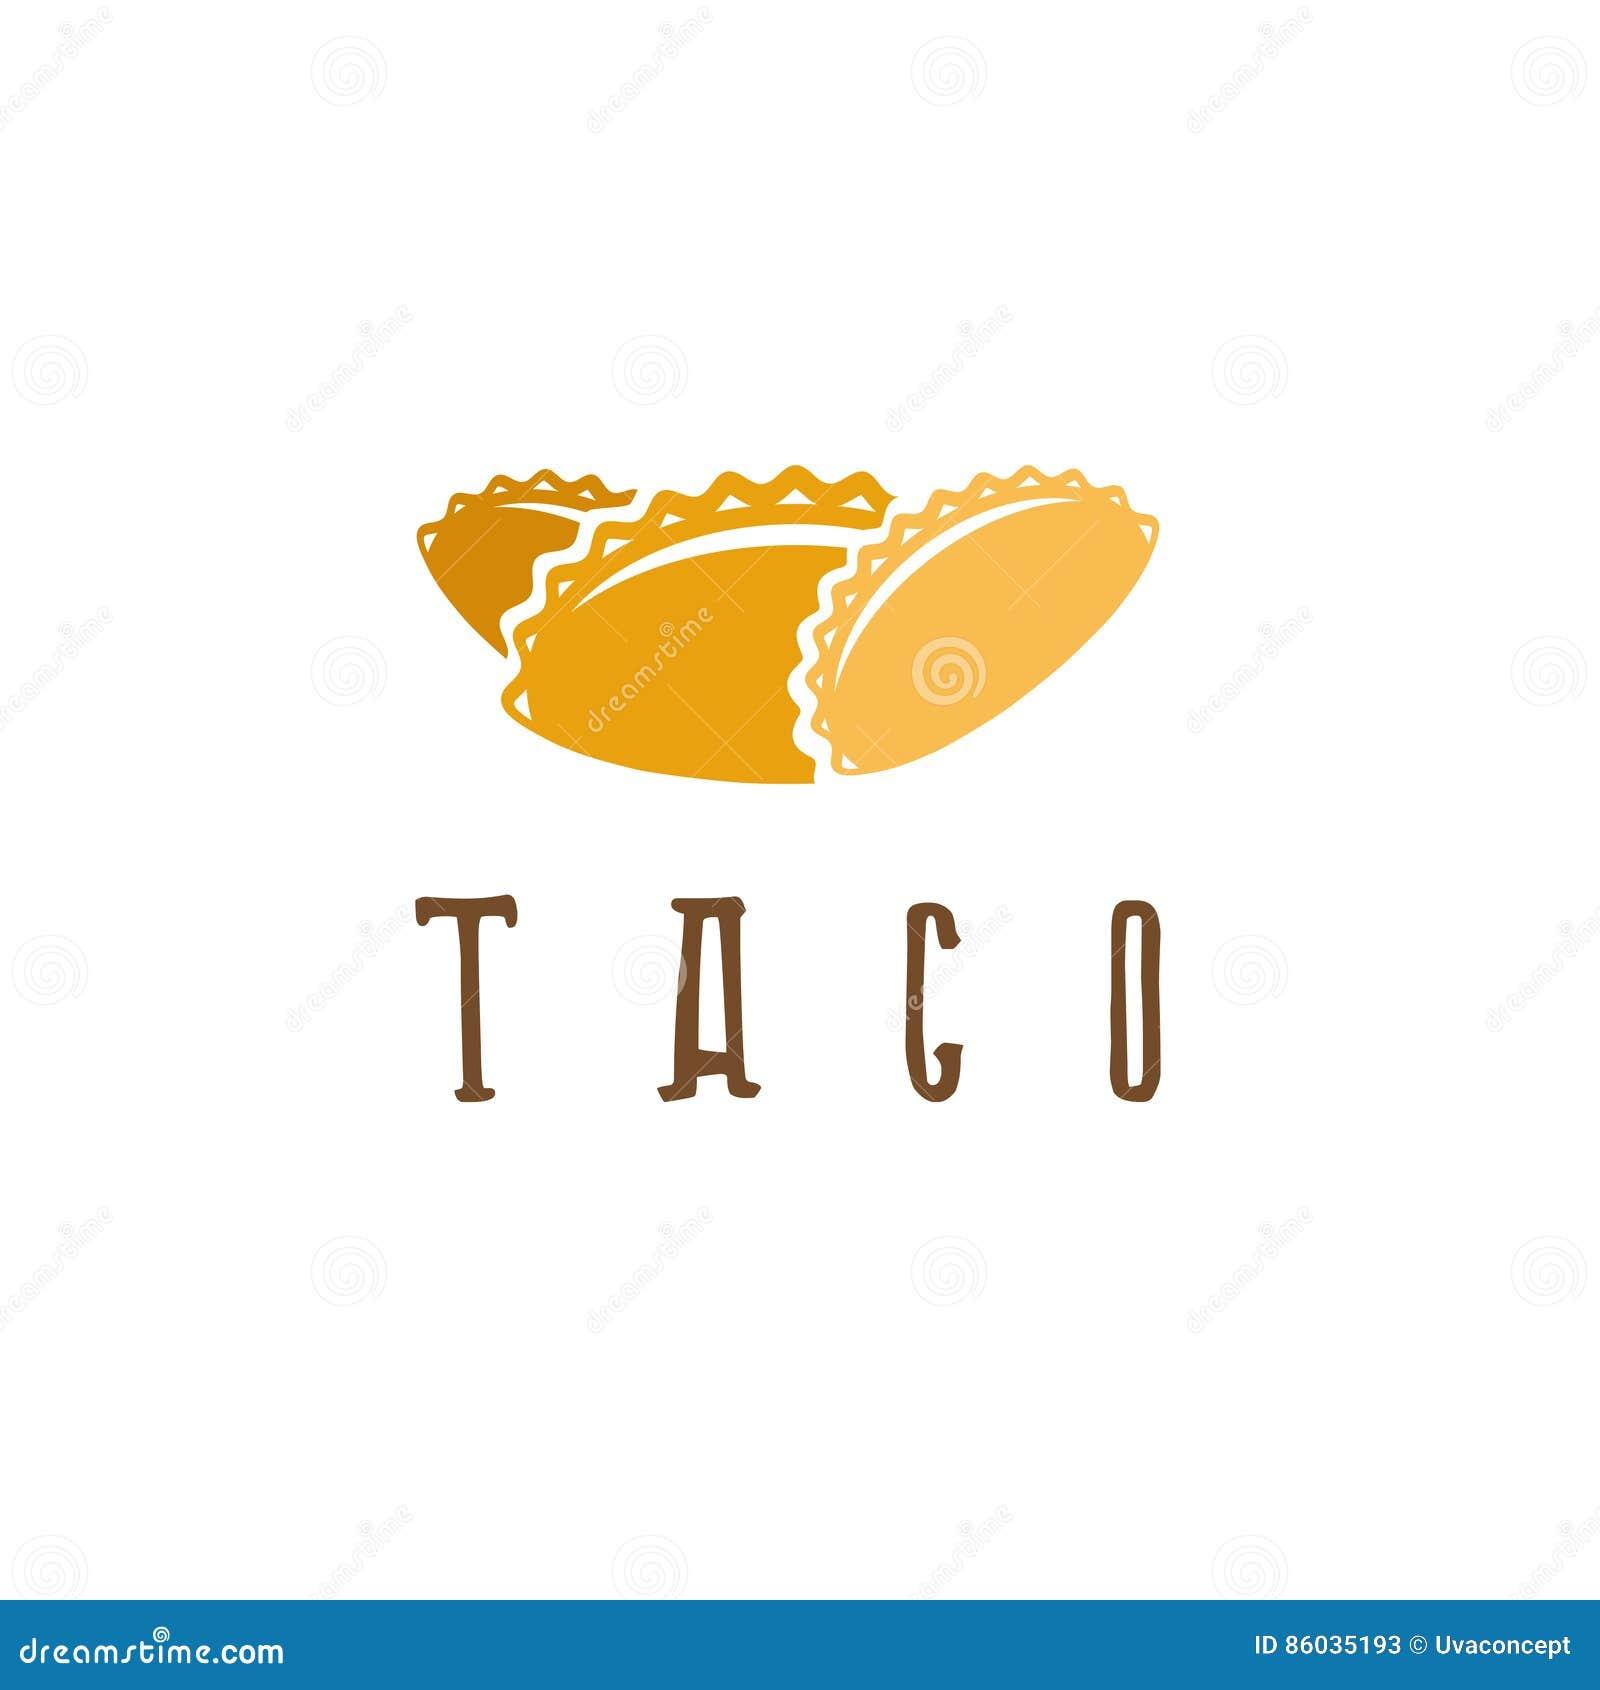 vector design template of taco mexican stock vector illustration